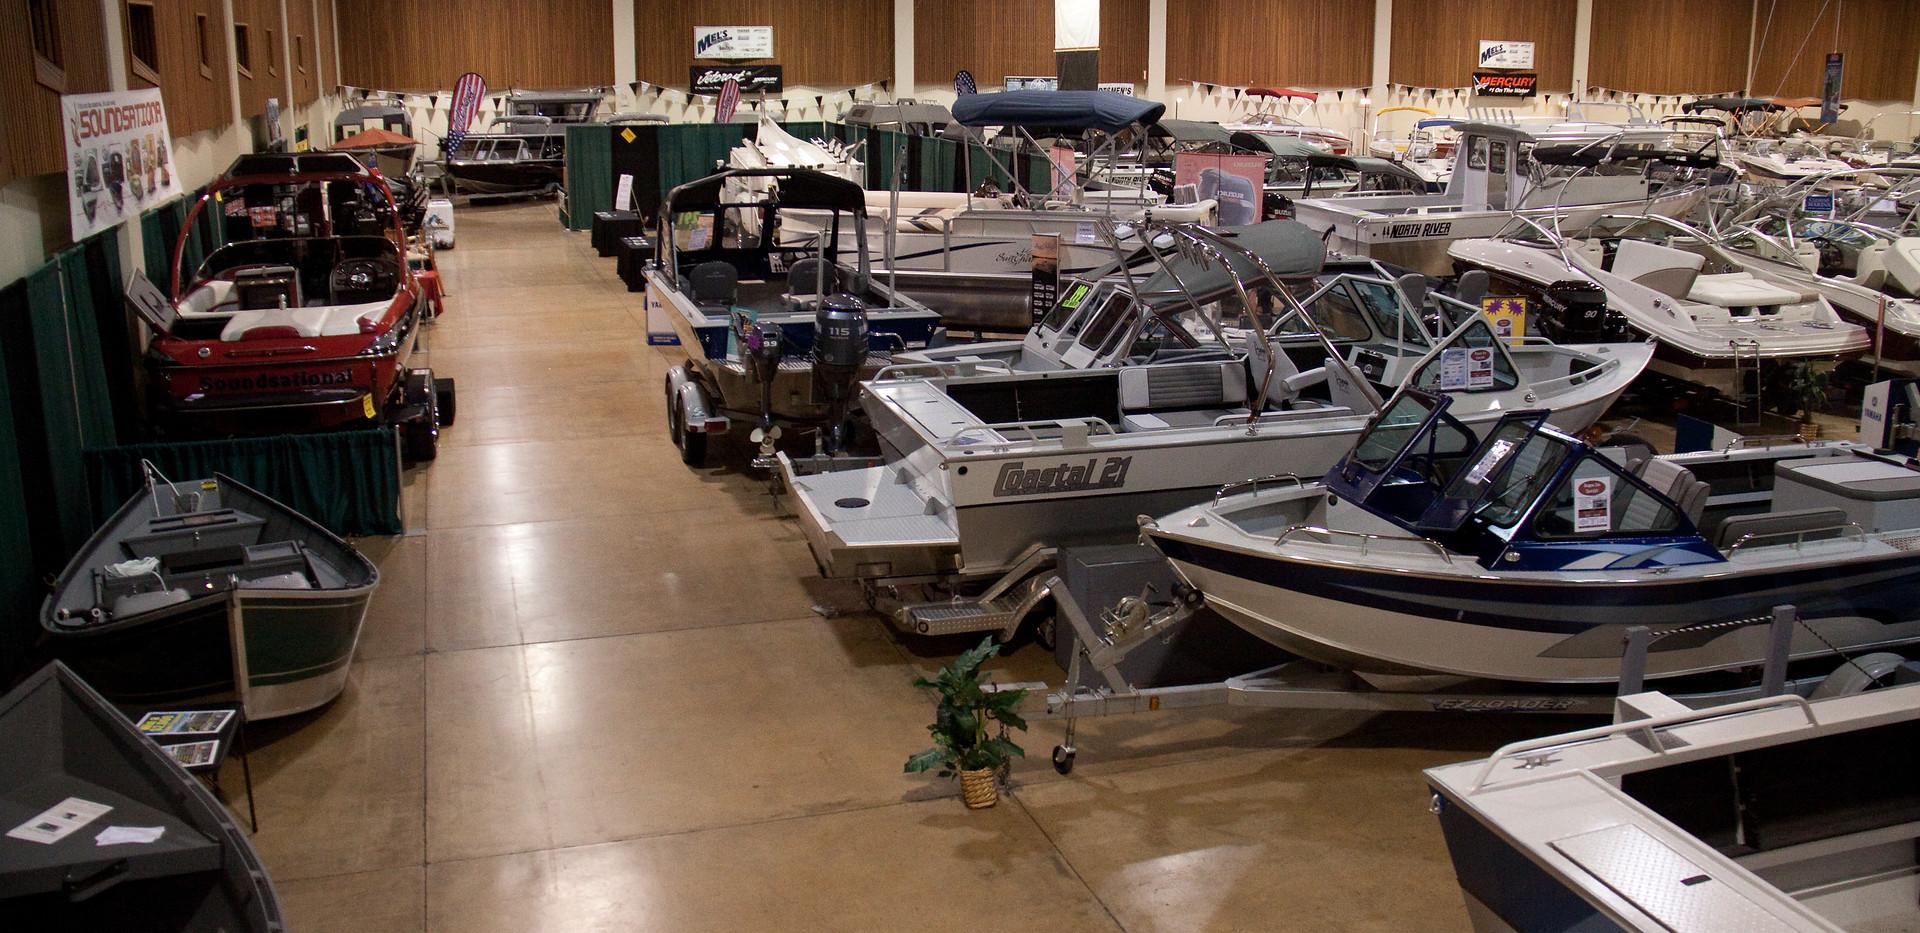 Lane Events Center Exhibit Hall Boat Show